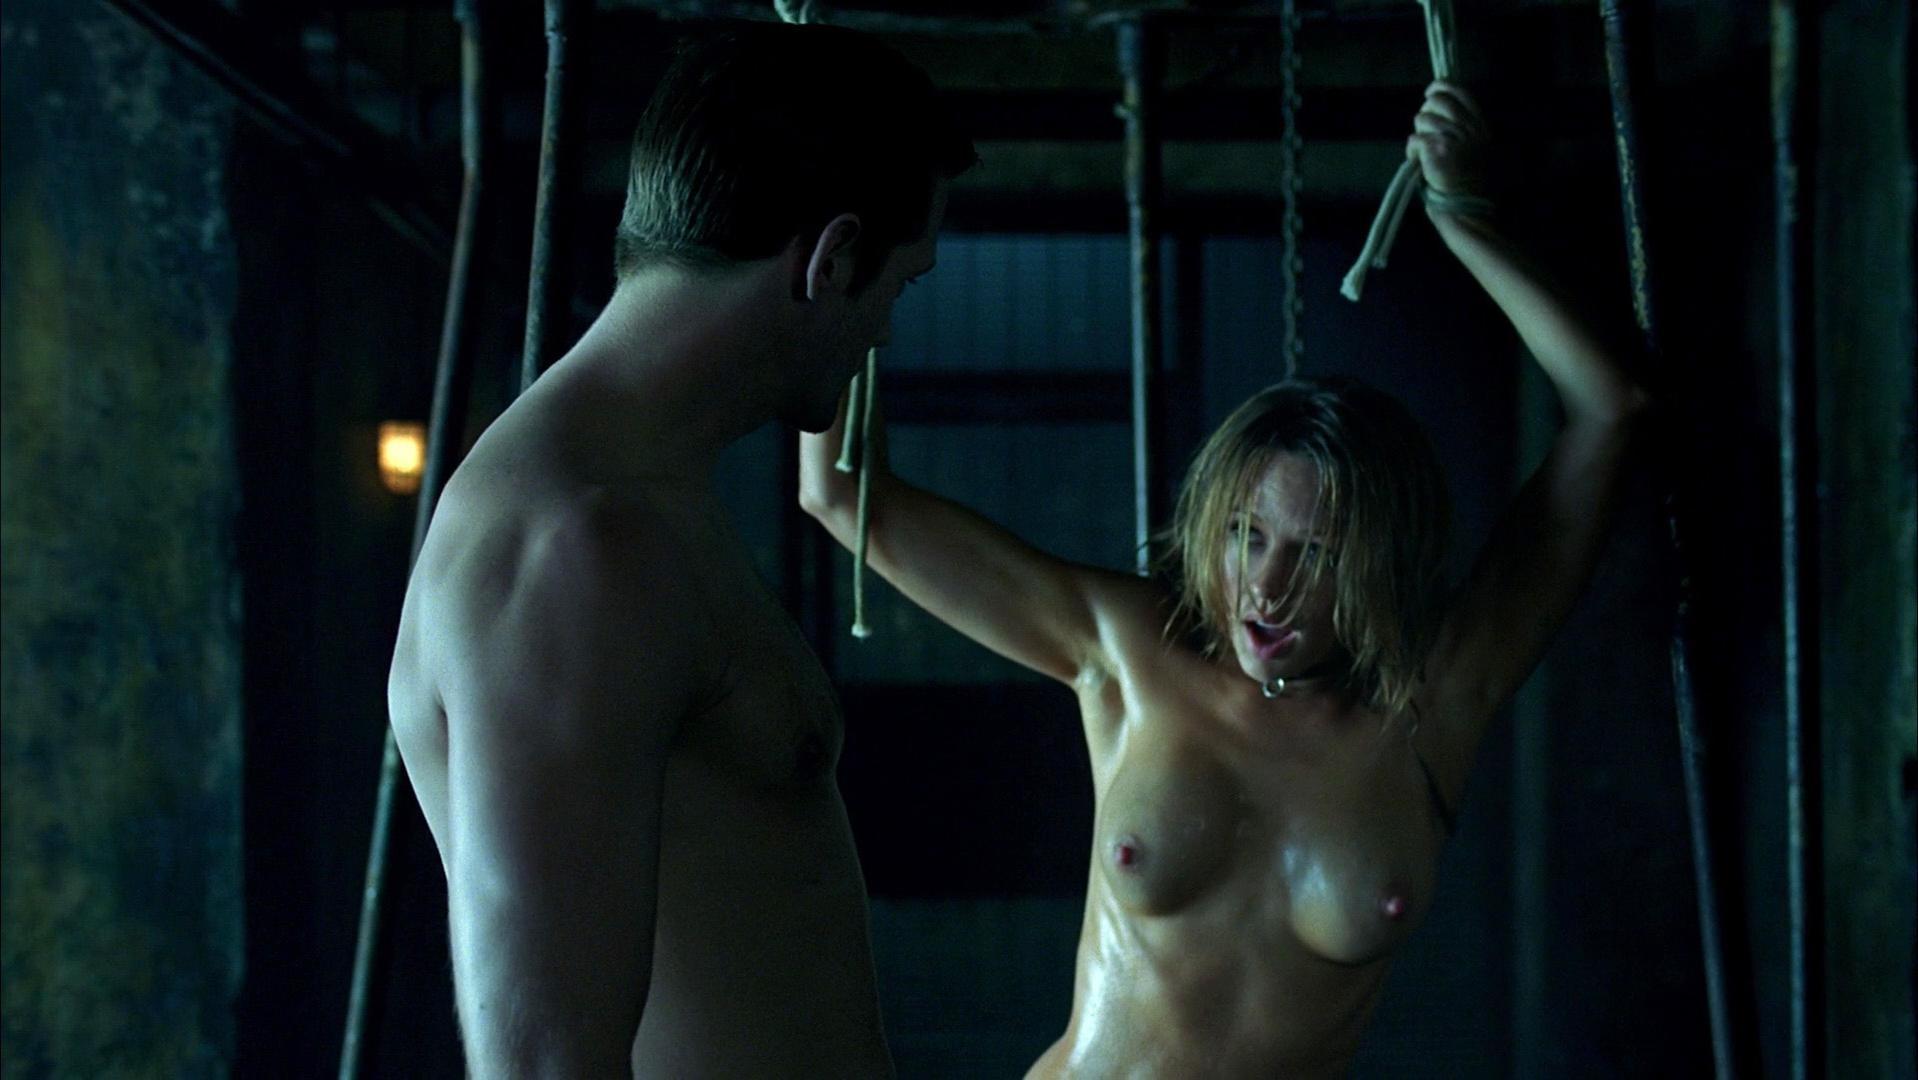 Natasha Alam nude - True Blood s03e01 (2010)